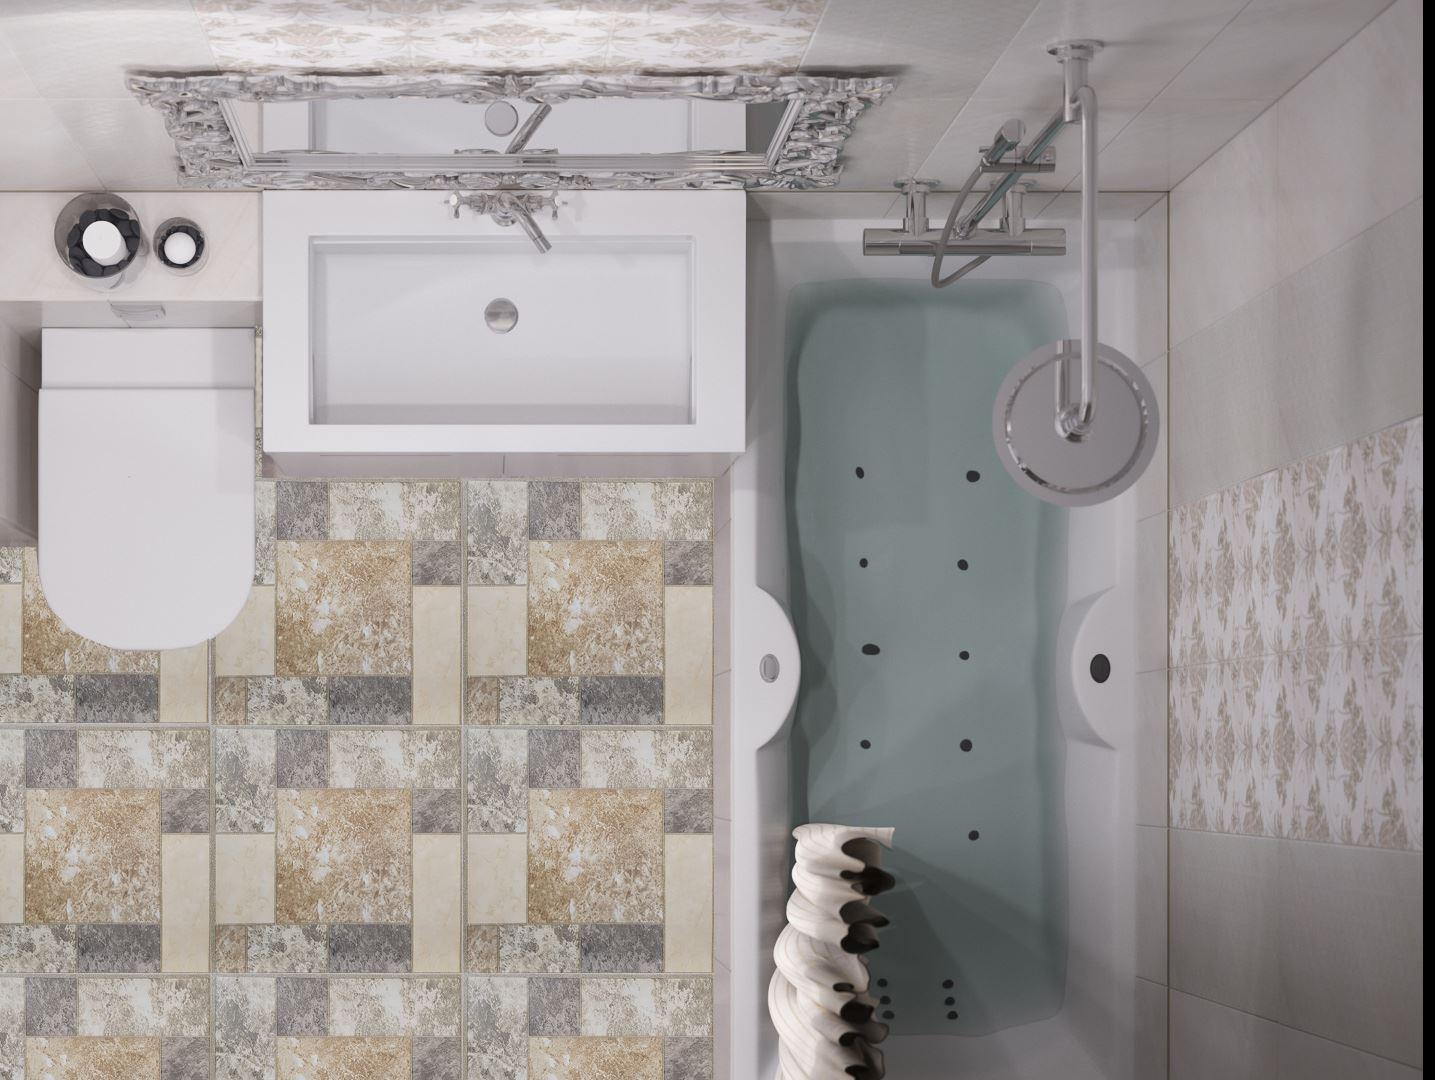 Floor tiles self adhesive vinyl flooring kitchen bathroom brown